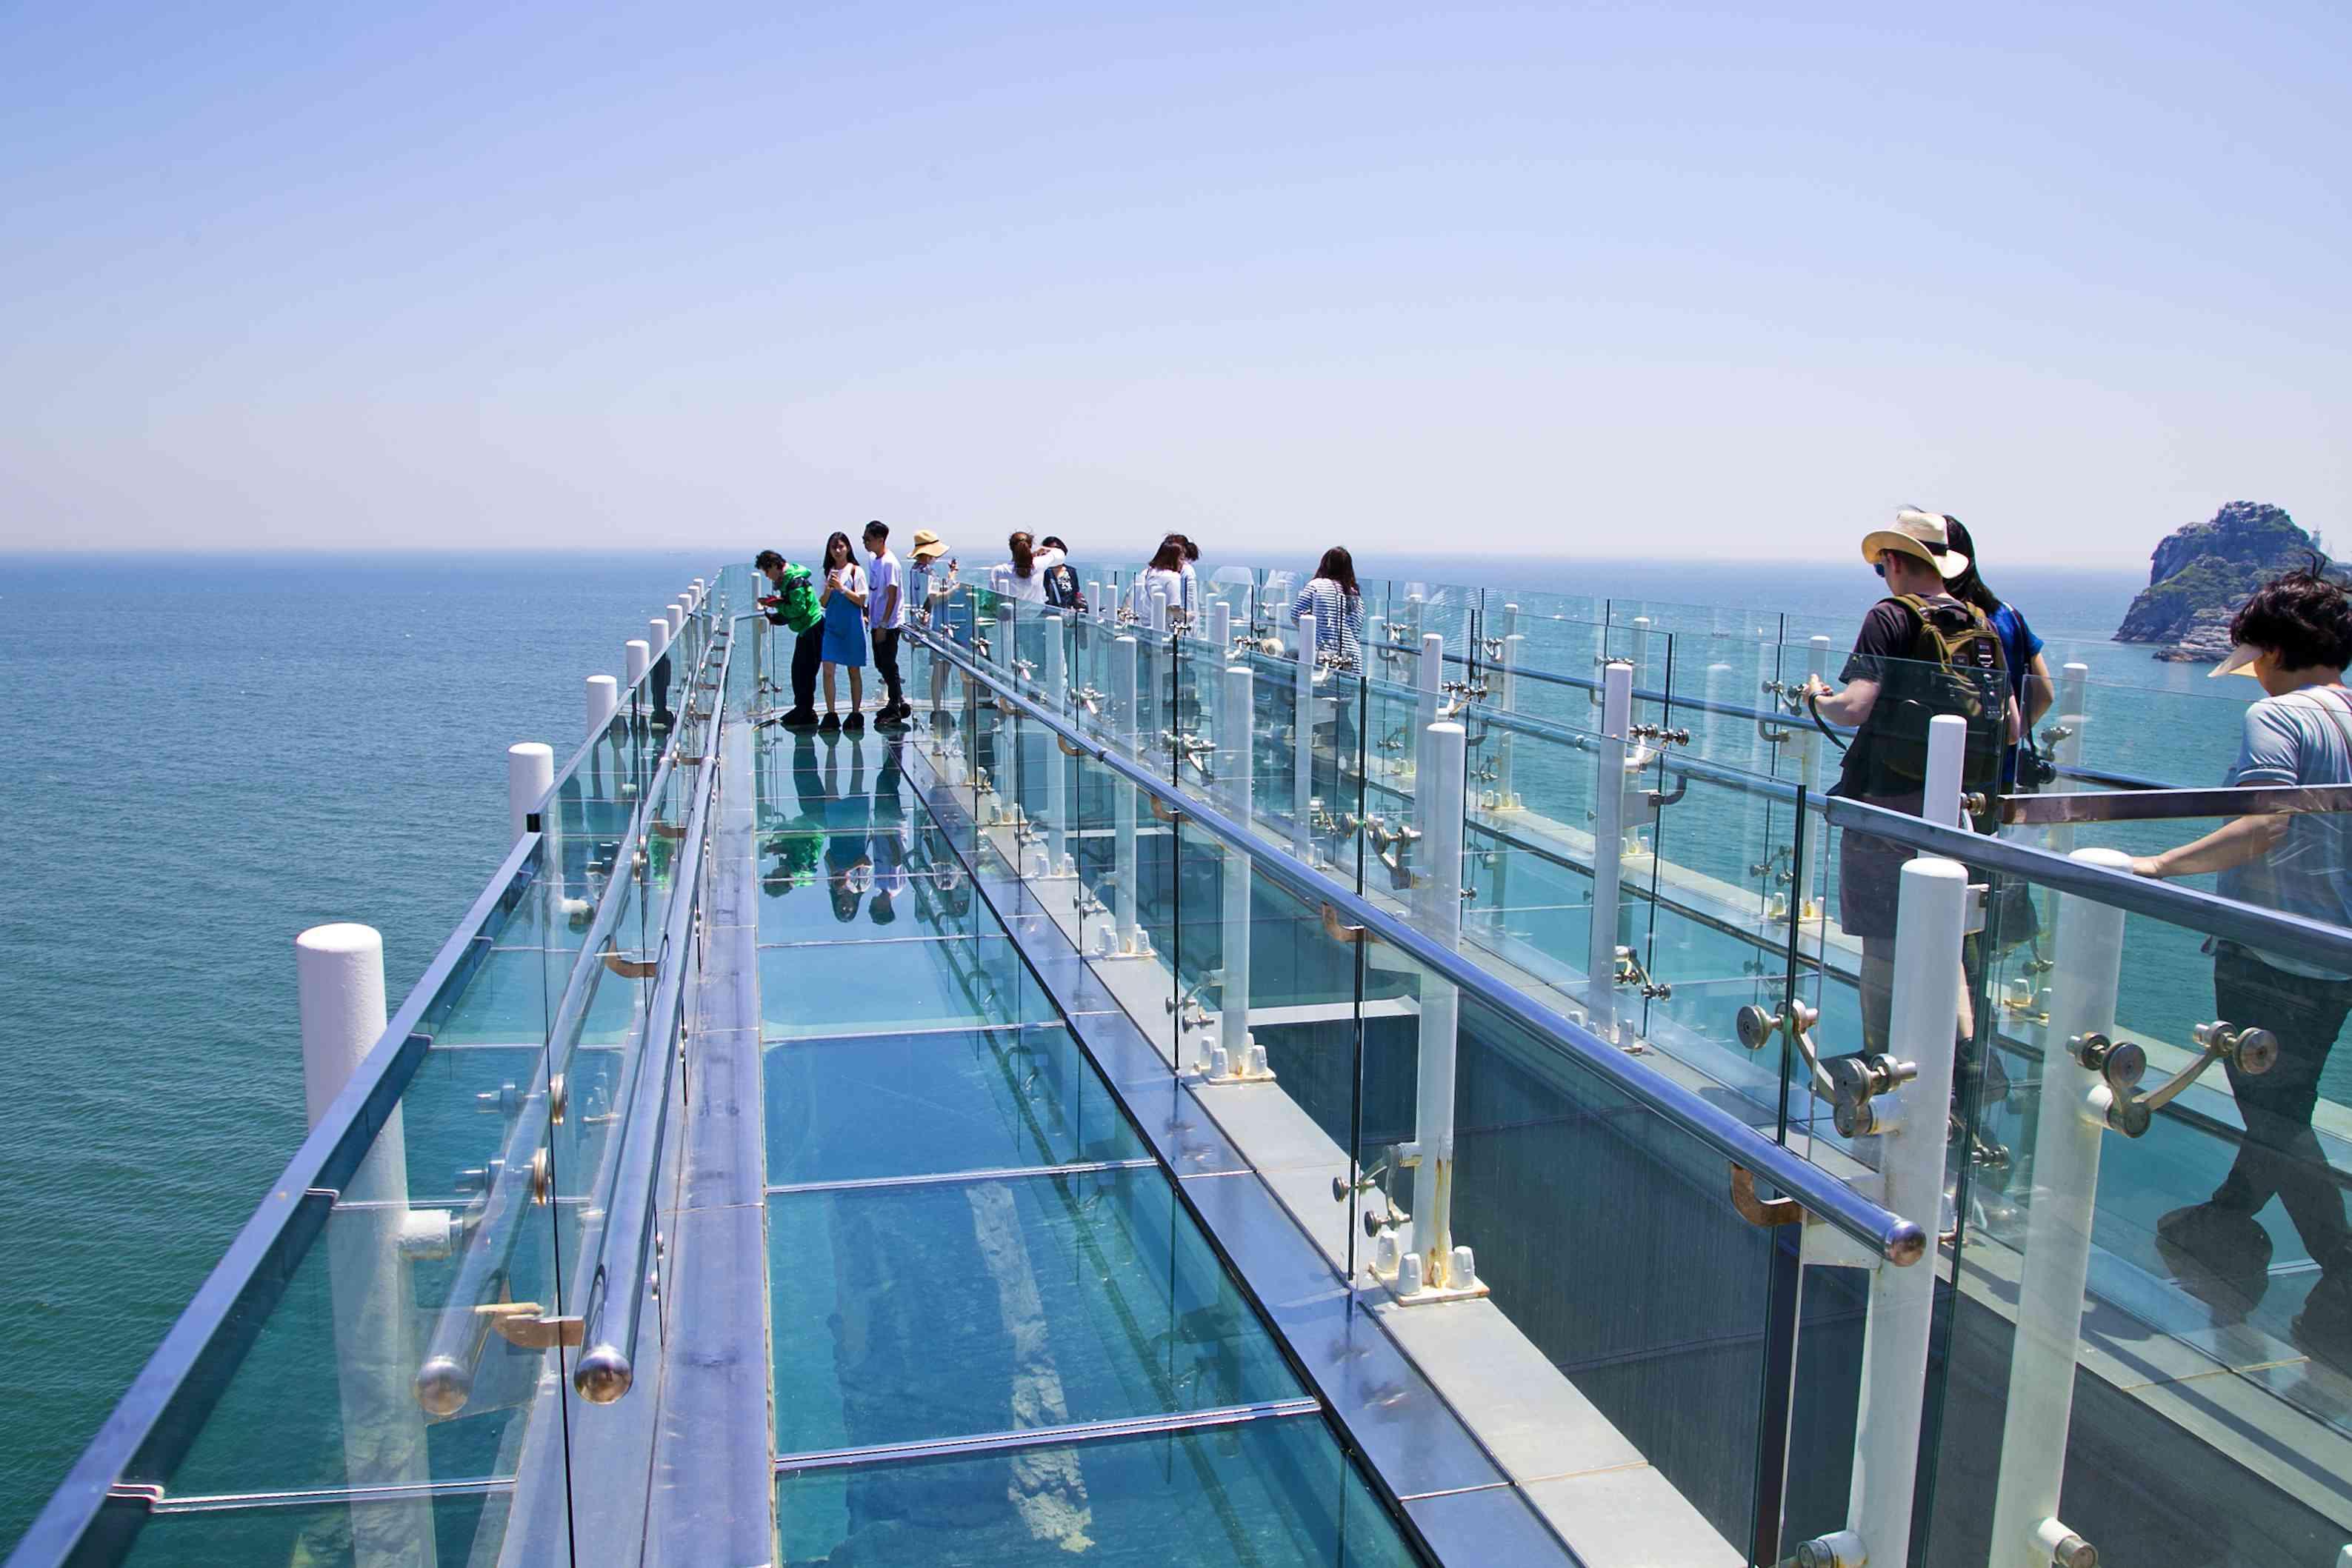 transparent Oryukdo skywalk over the water in Busan city, South Korea